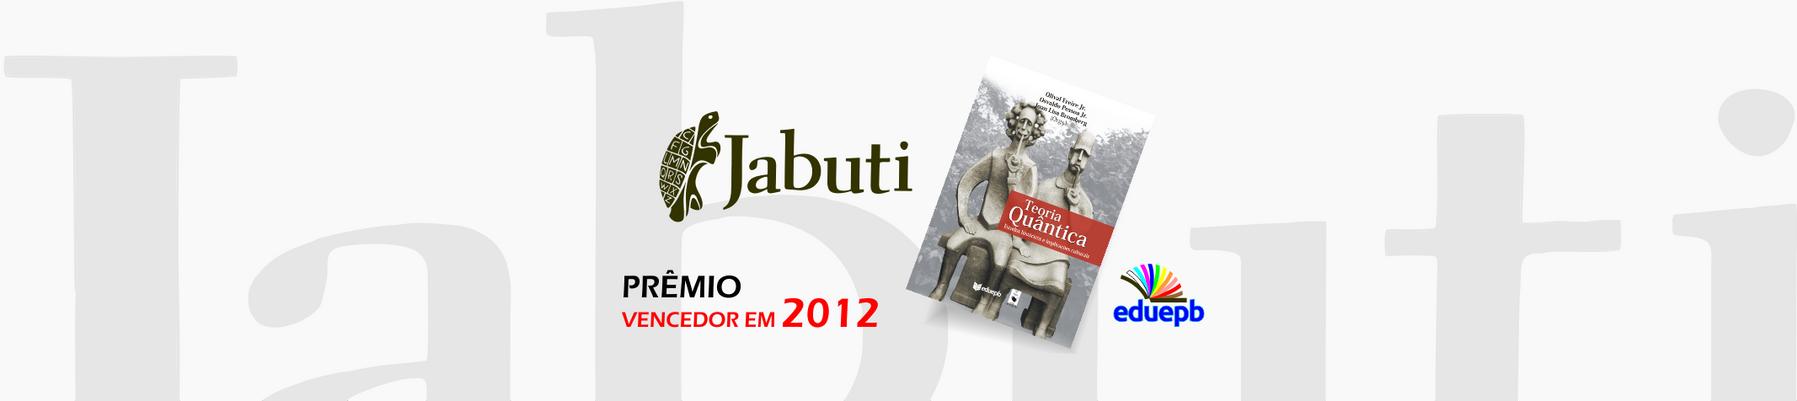 JABUTI 1.png